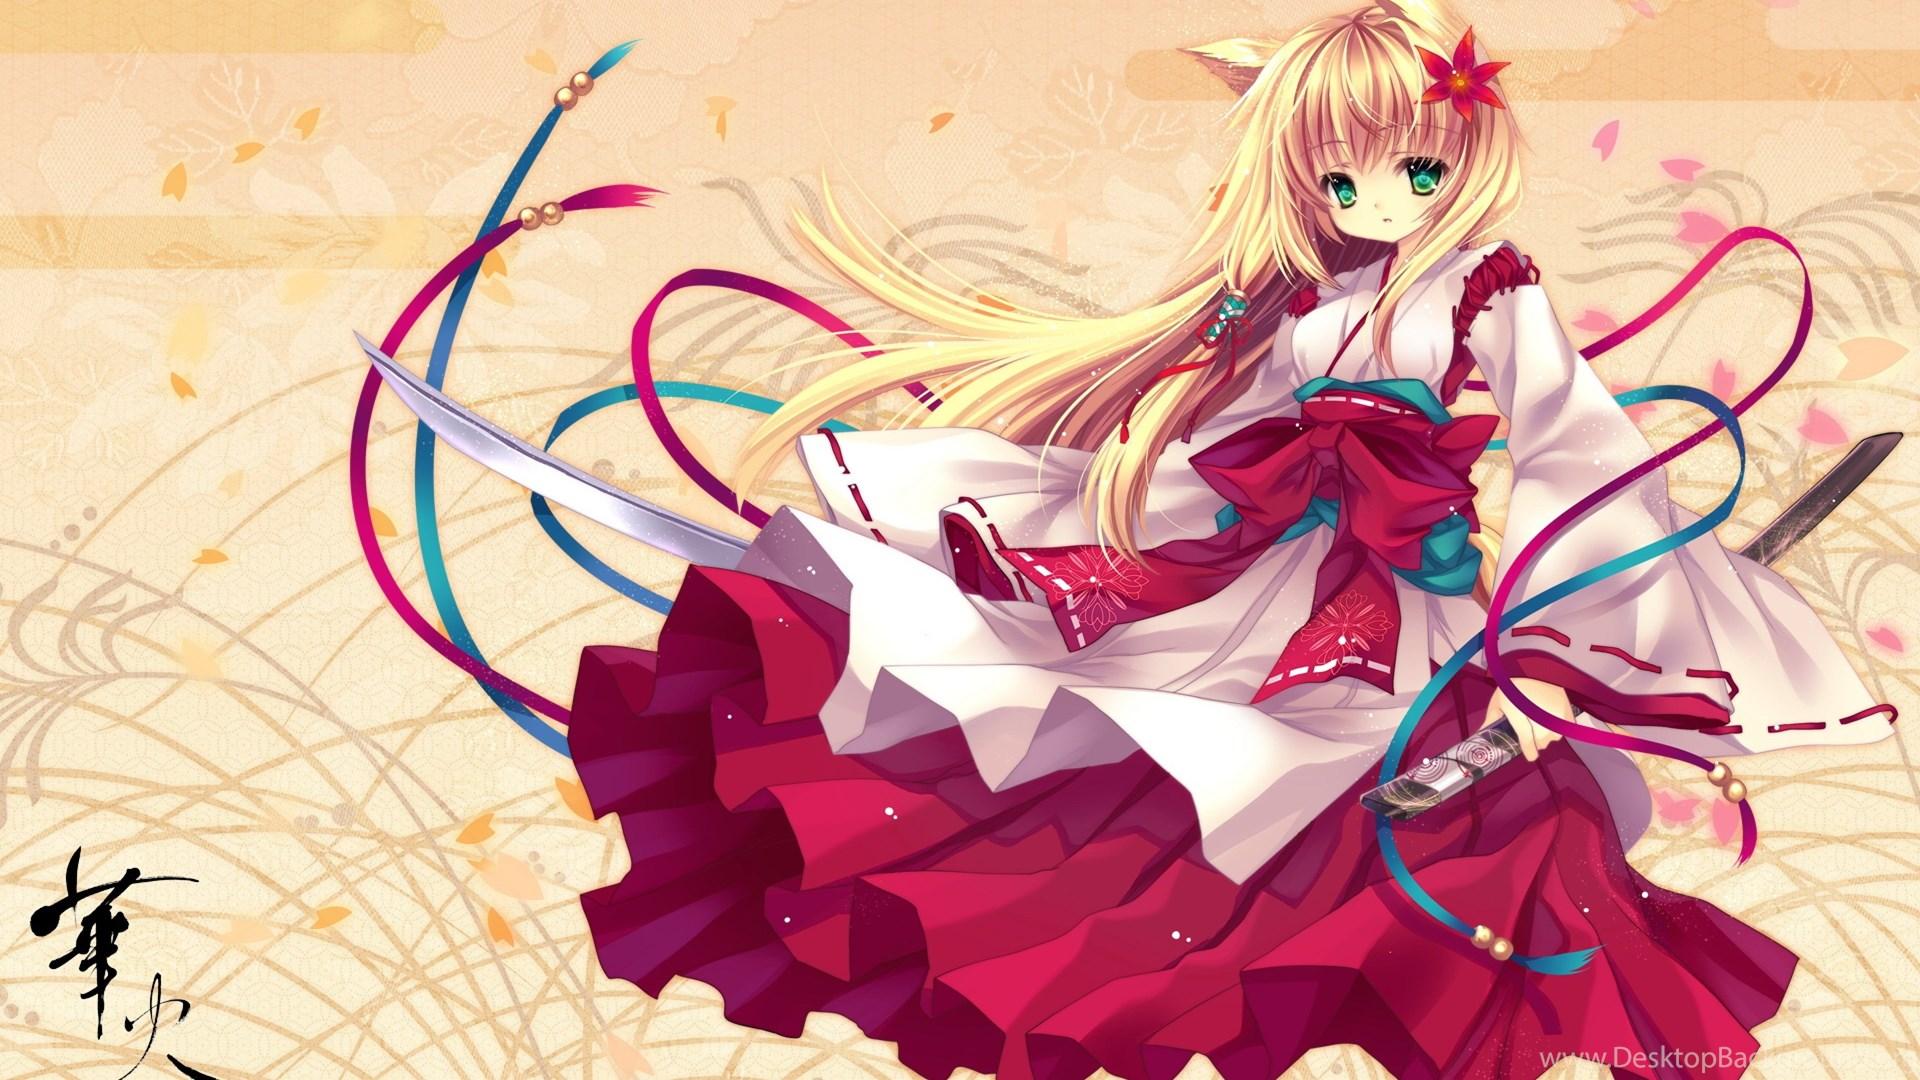 Unduh 200+ Wallpaper Anime Neko Hd HD Terbaik